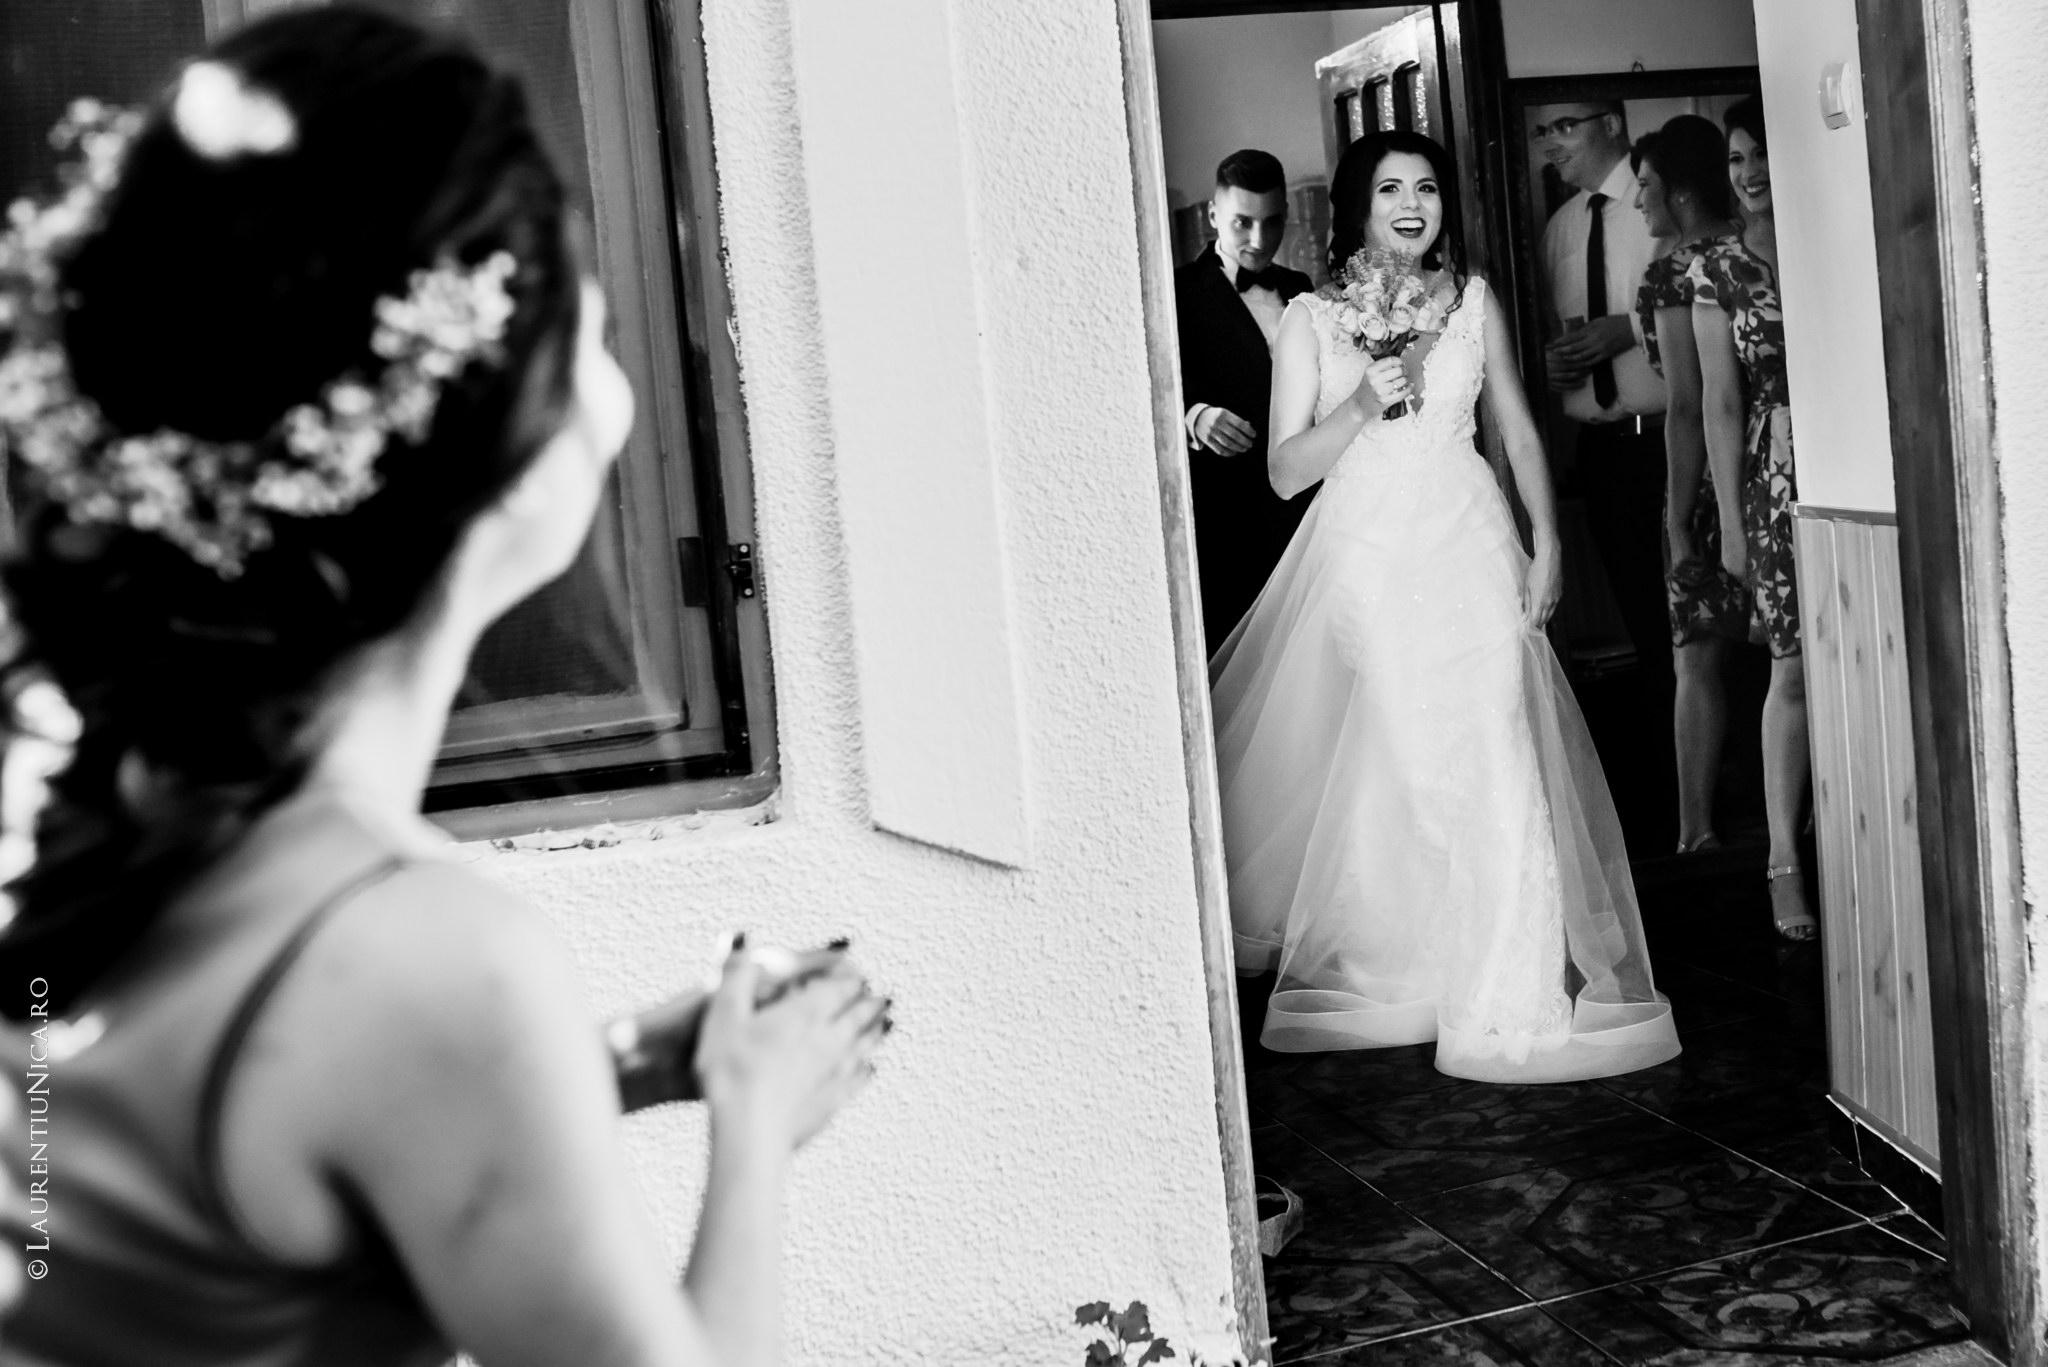 fotografii nunta craiova bia alex fotograf nunta laurentiu nica 20 - Bia & Alex | Fotografii nunta | Craiova